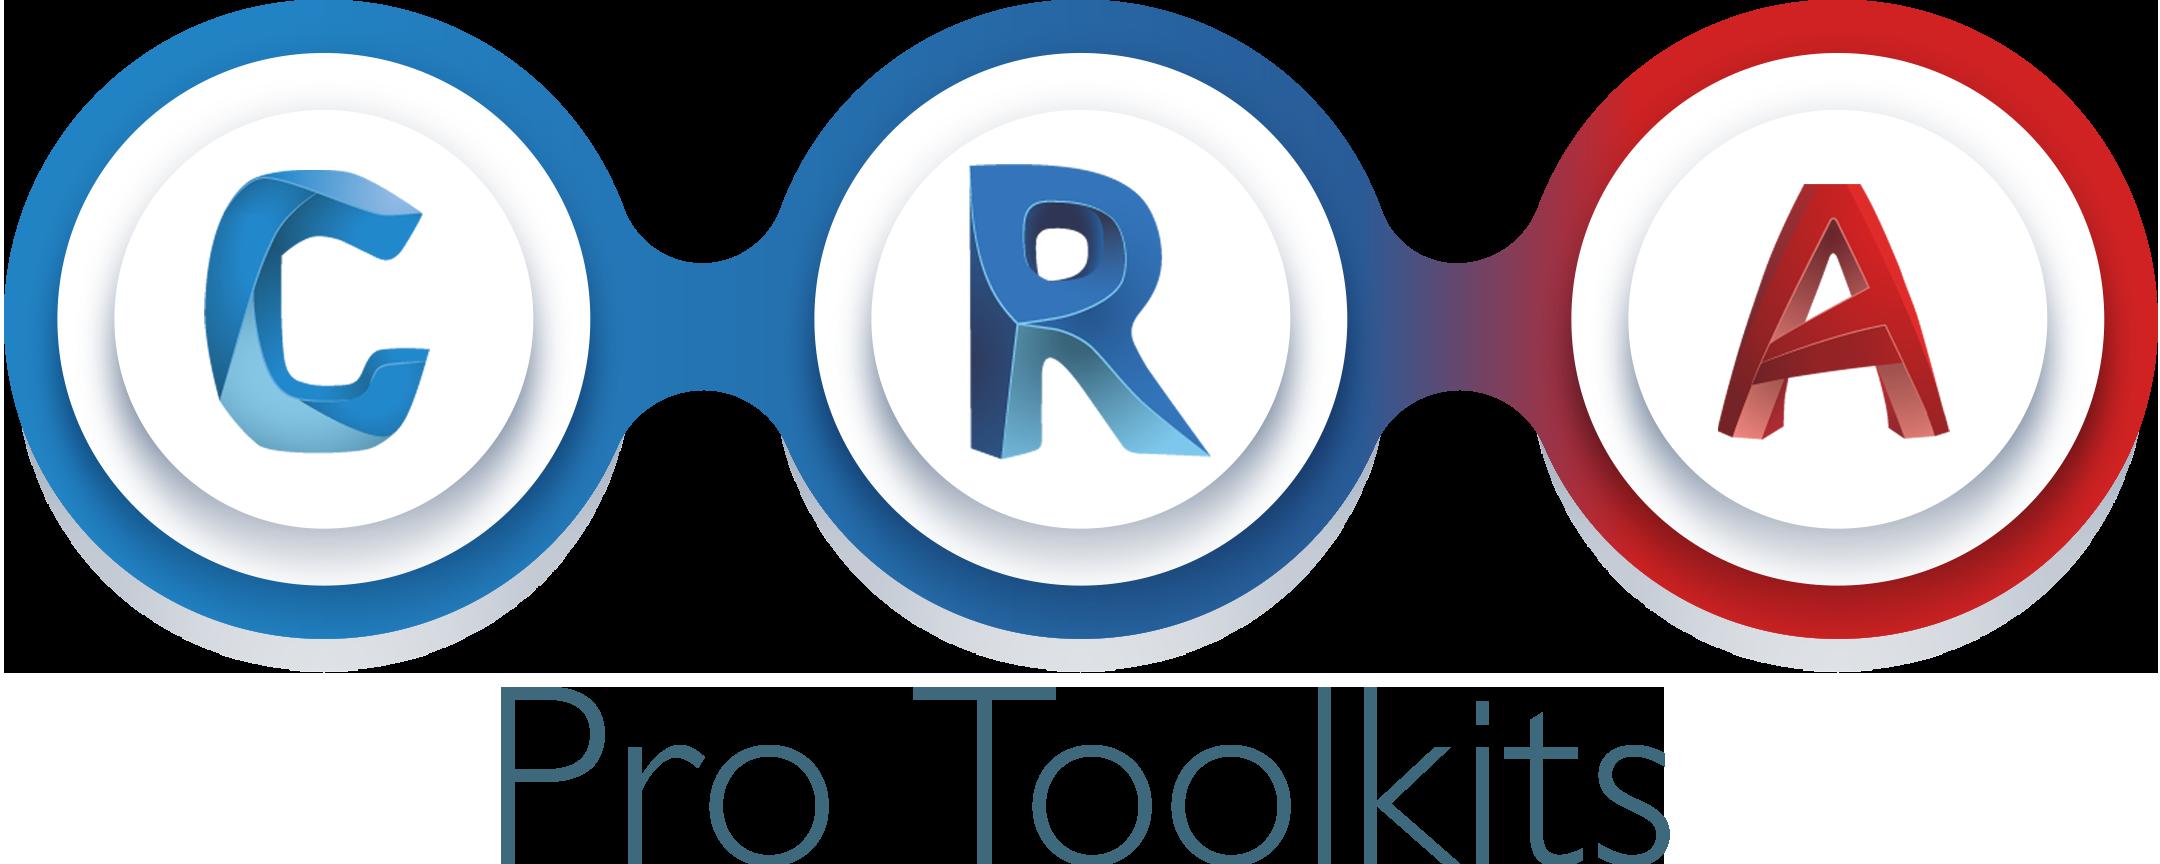 Pro Toolkits ToolChest copy